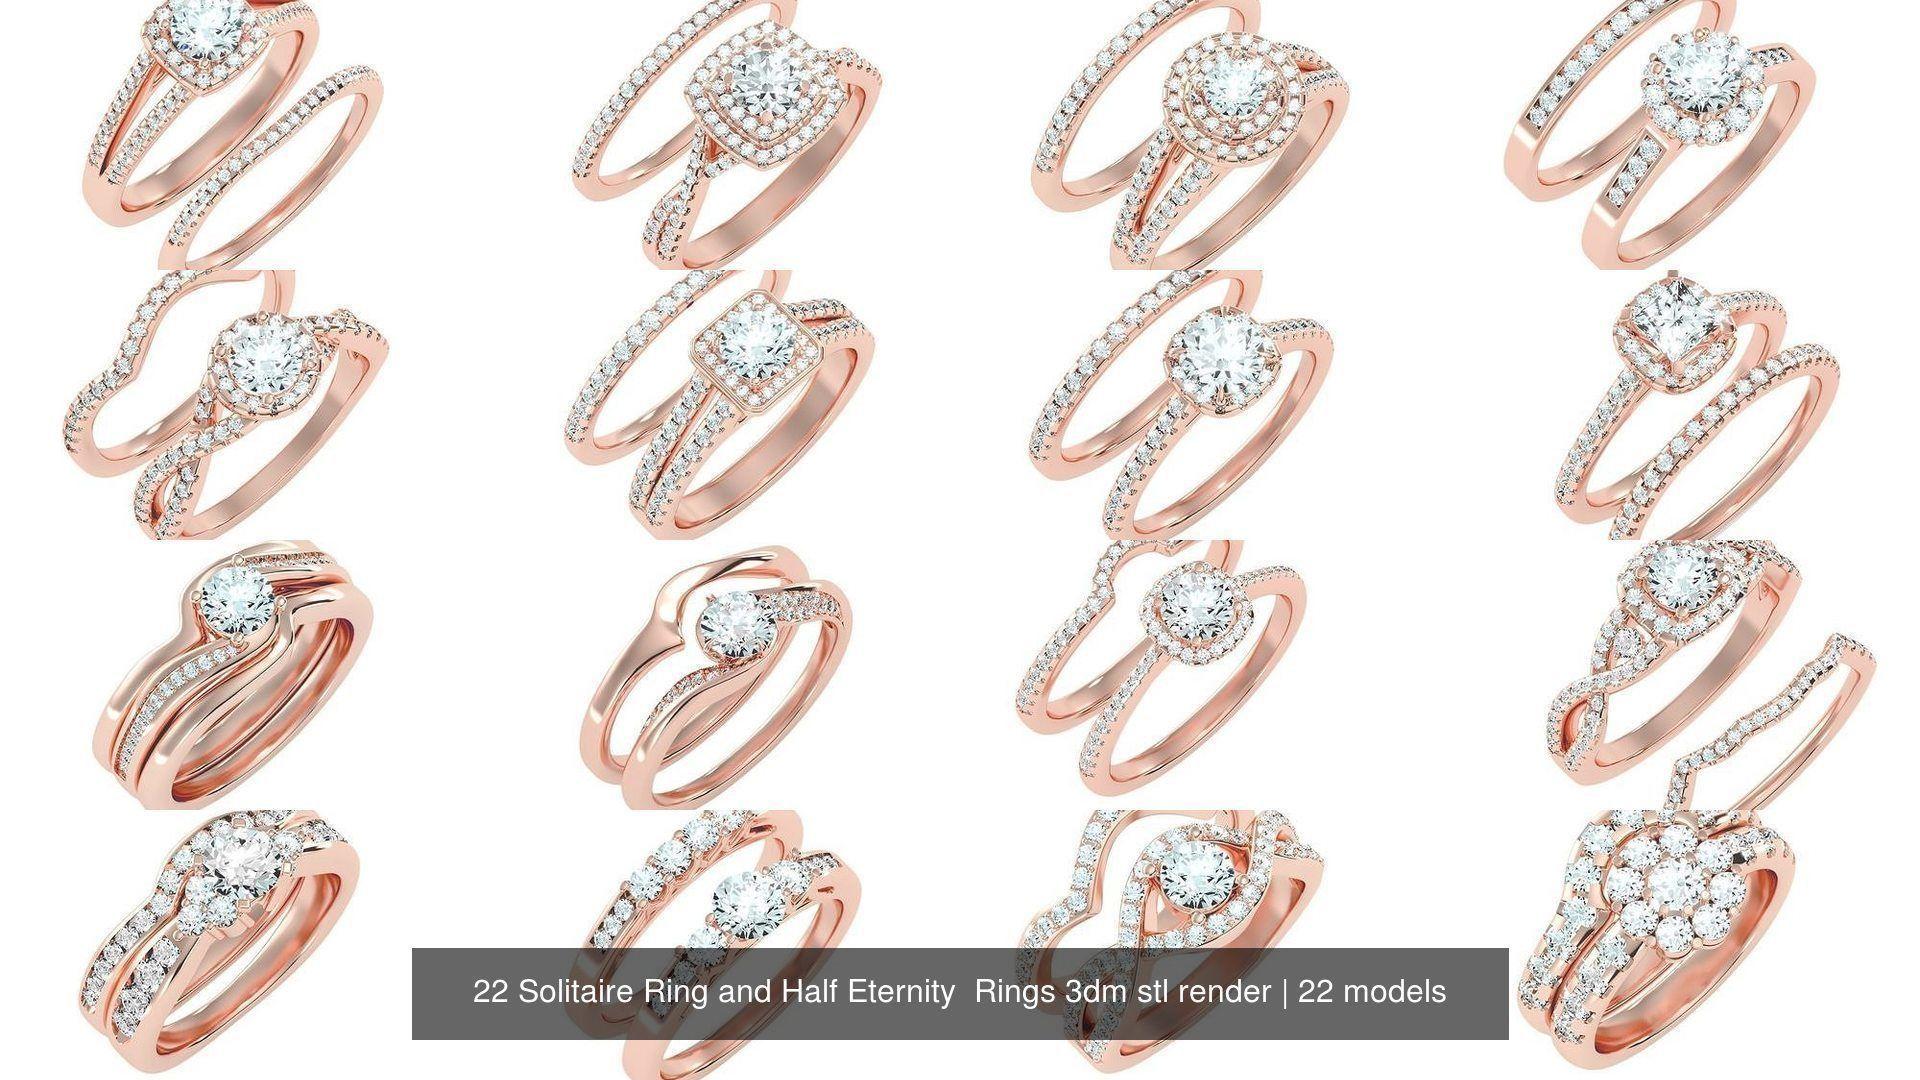 22 Solitaire Ring and Half Eternity  Rings 3dm stl render